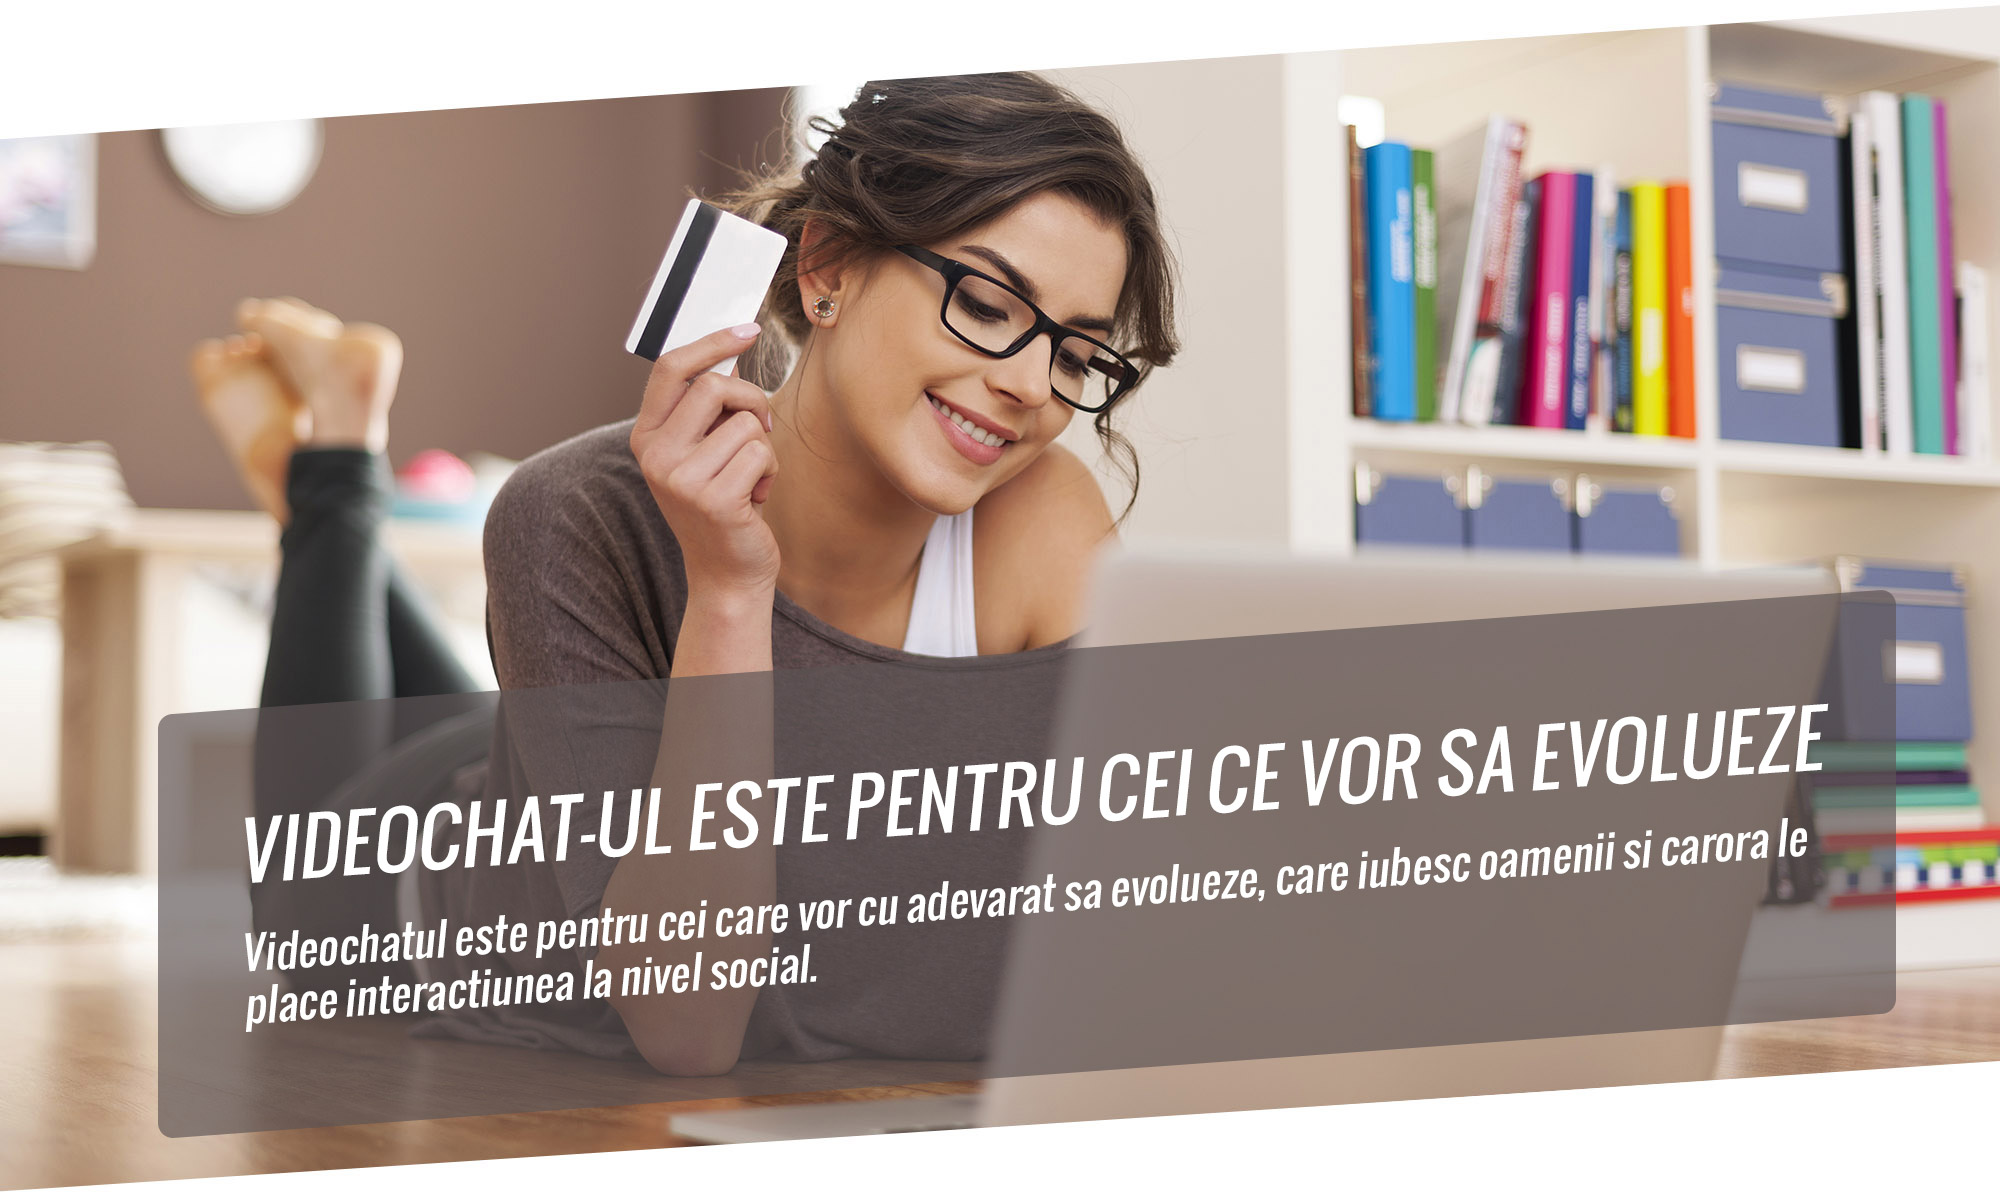 angajari video chat Pitesti